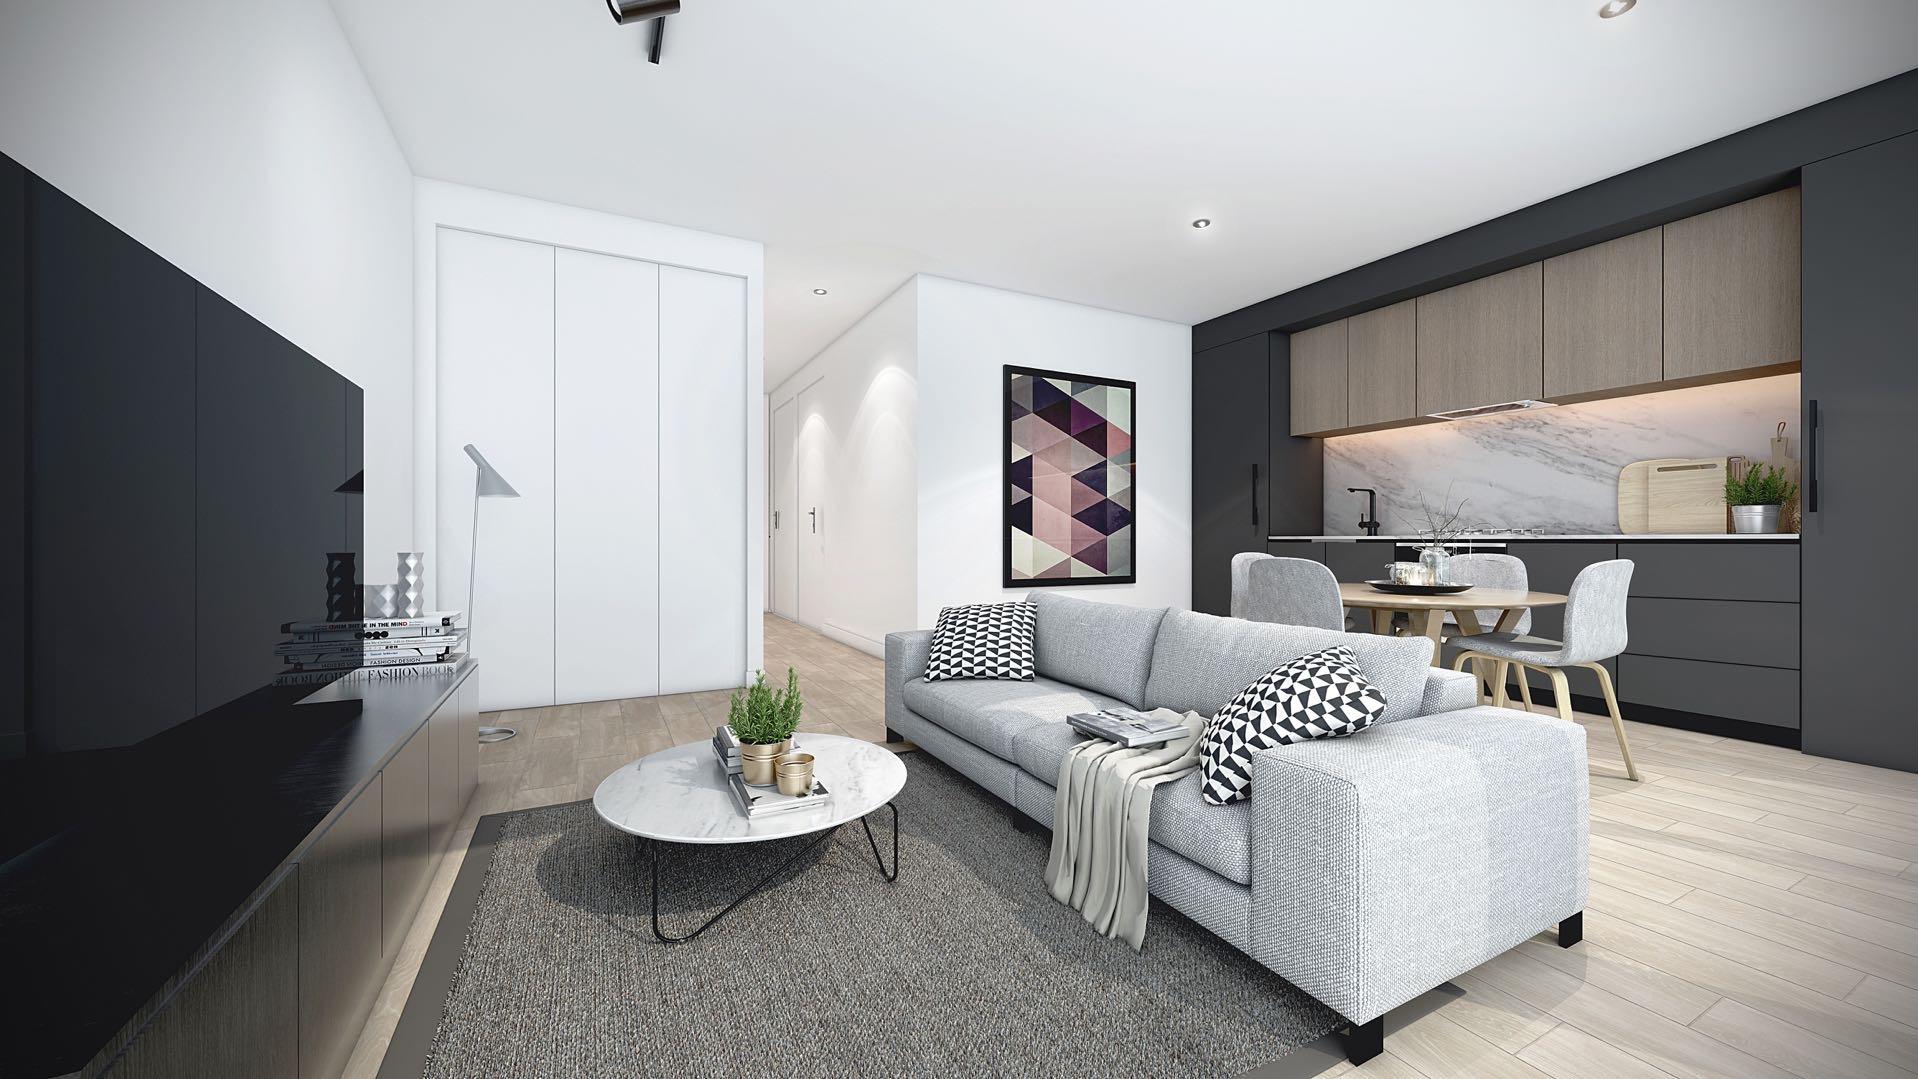 Ava Malvern Apartments